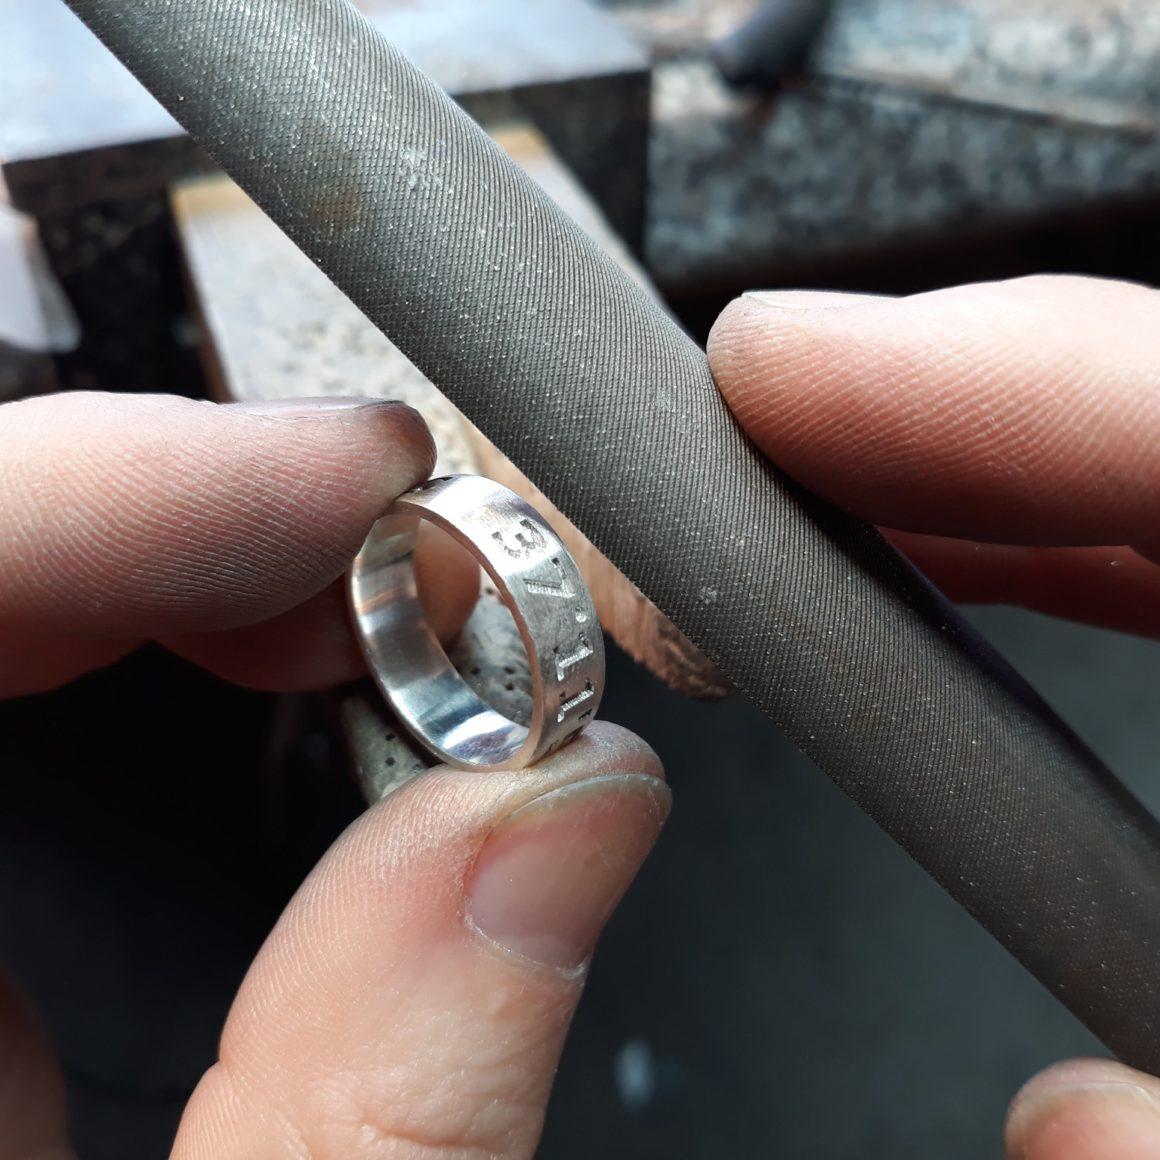 Park Road Jewellery, Bespoke Handmade Sterling Silver Bespoke Personalised Mountain Peak Pendant Jewellery